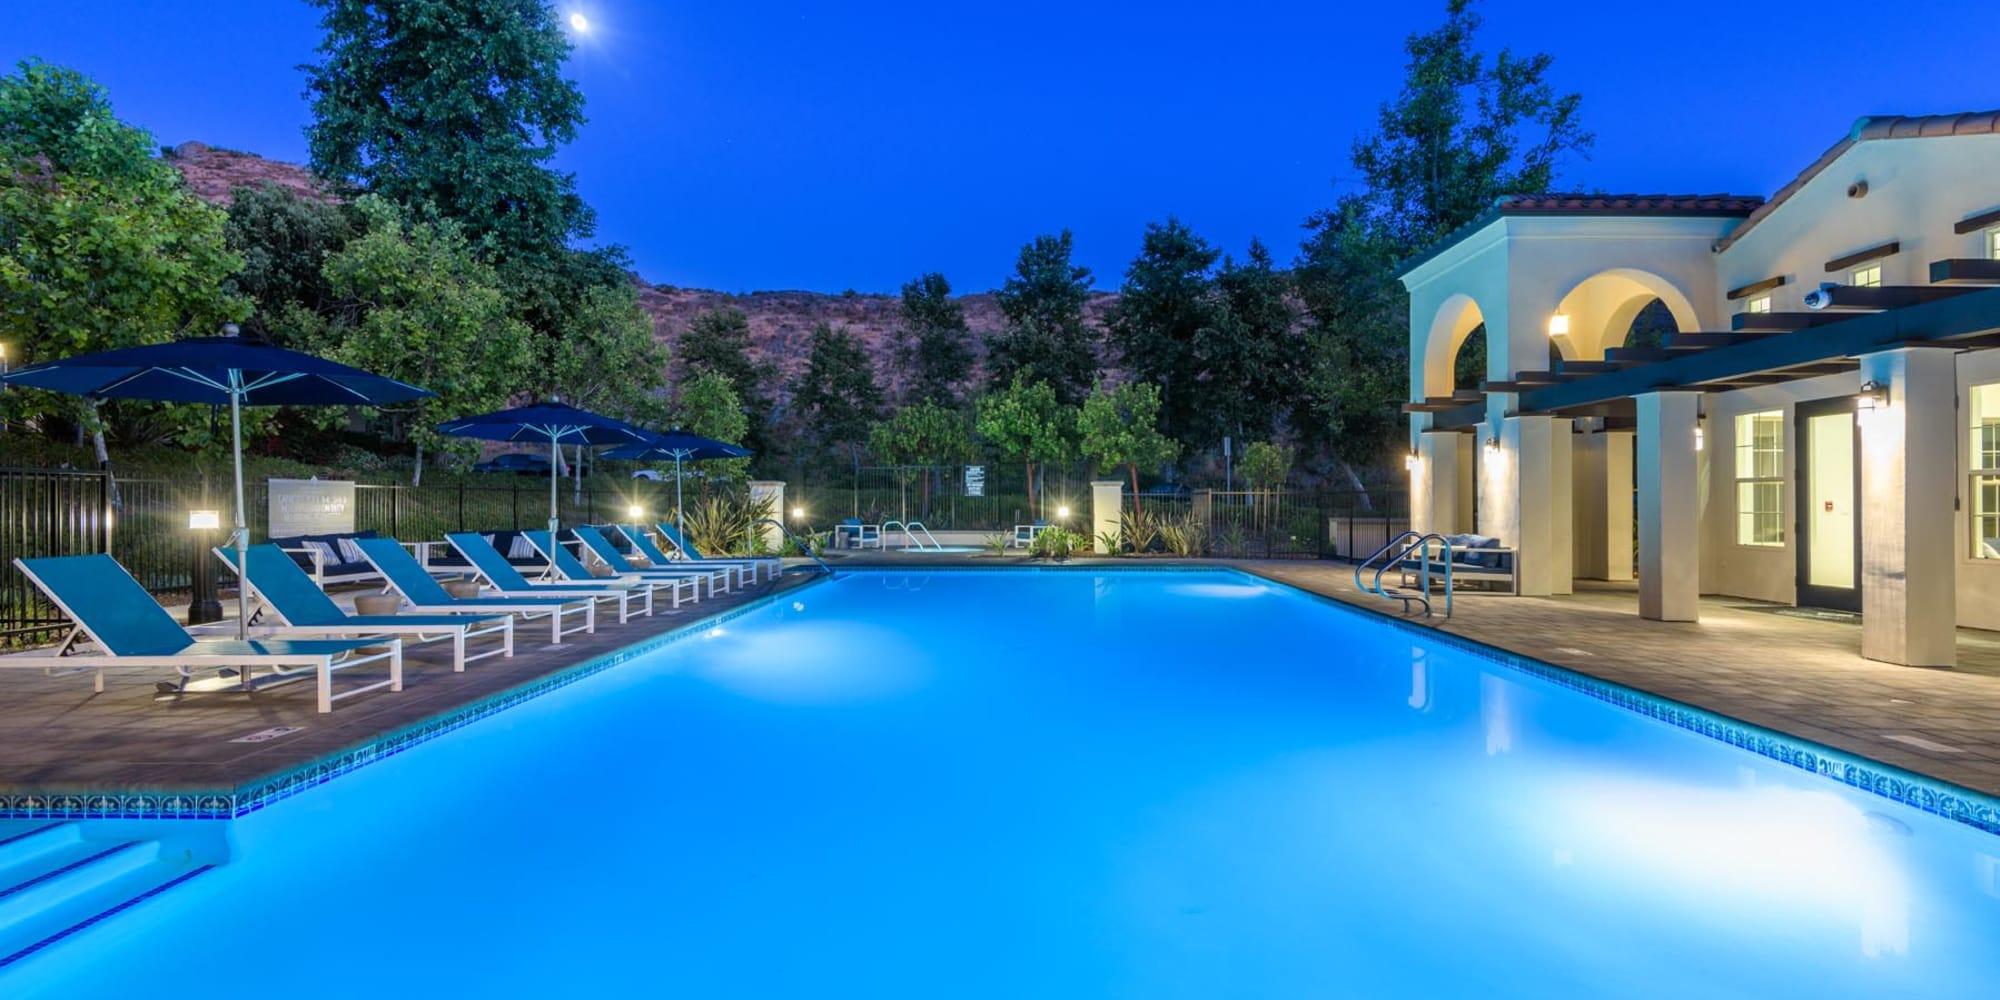 Underwater lights illuminating the pool at dusk at Mission Hills in Camarillo, California